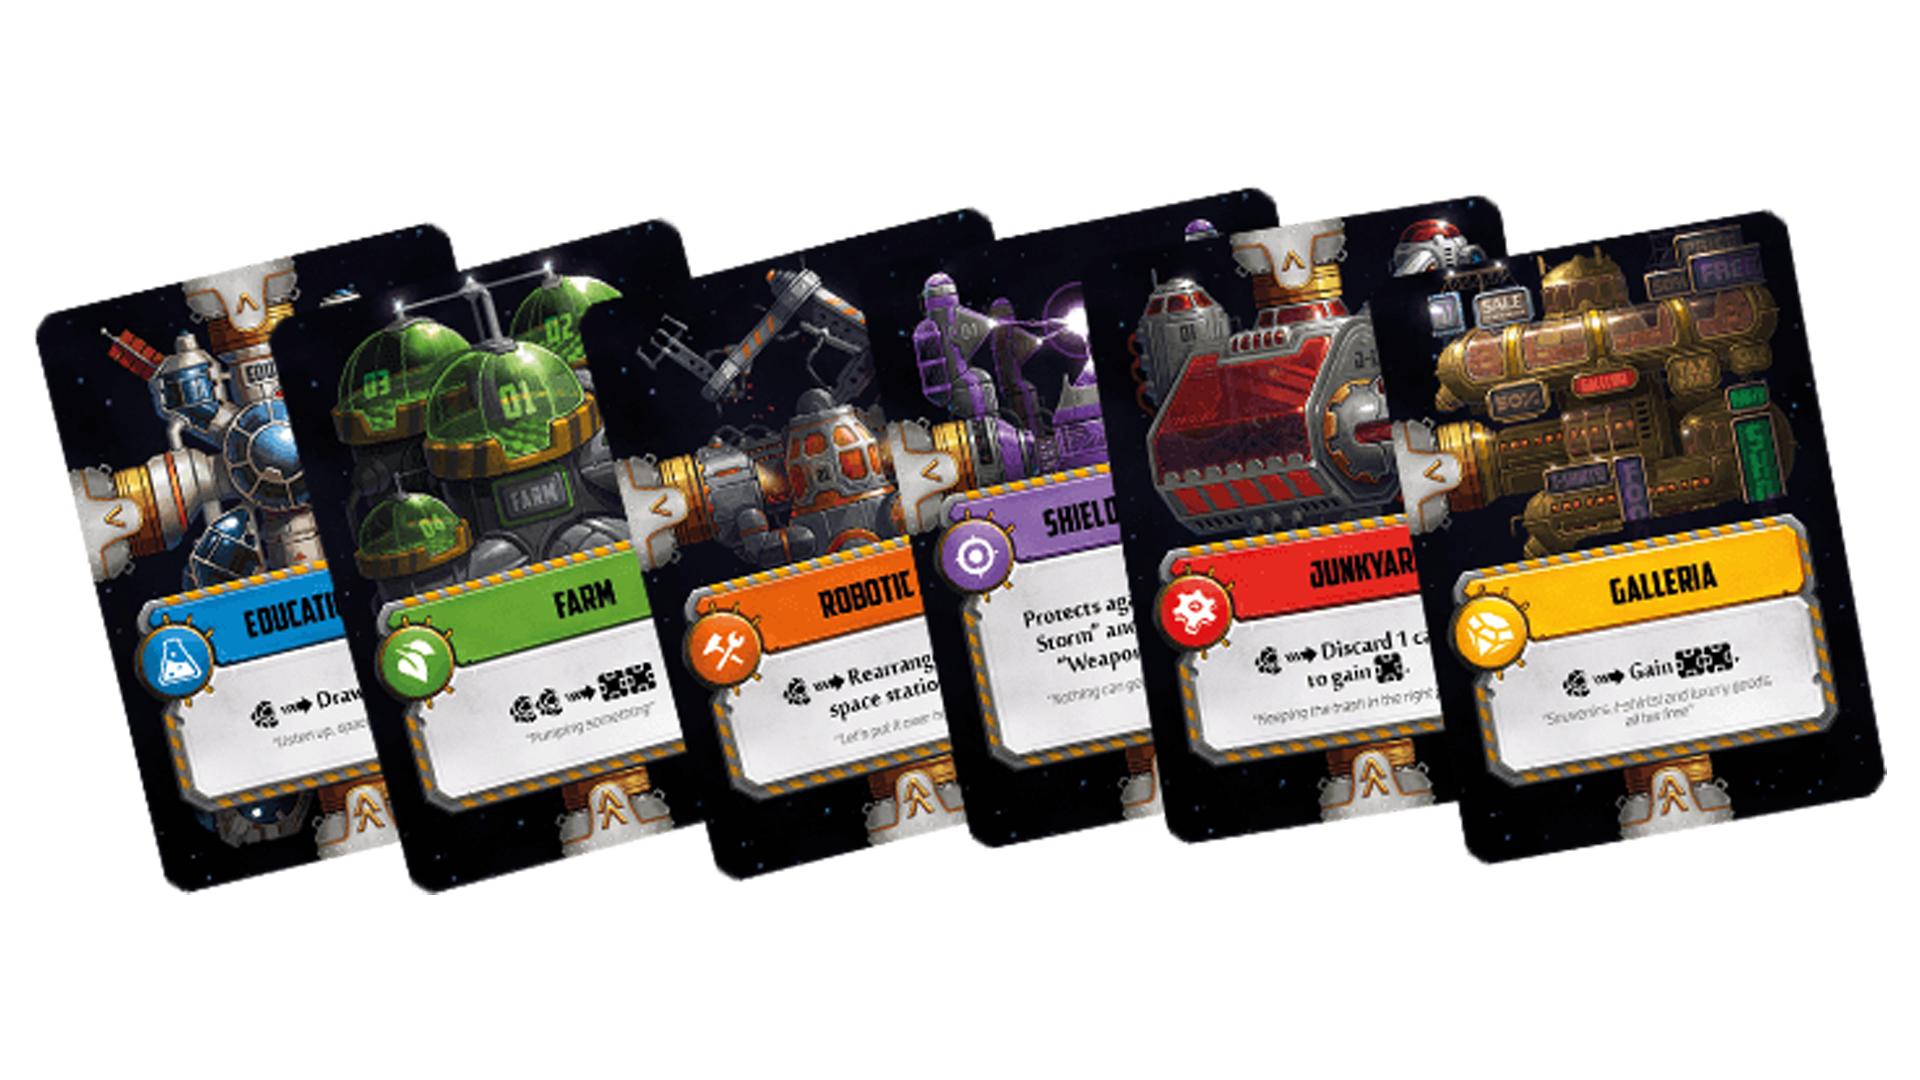 Star Scrappers: Orbital board game cards